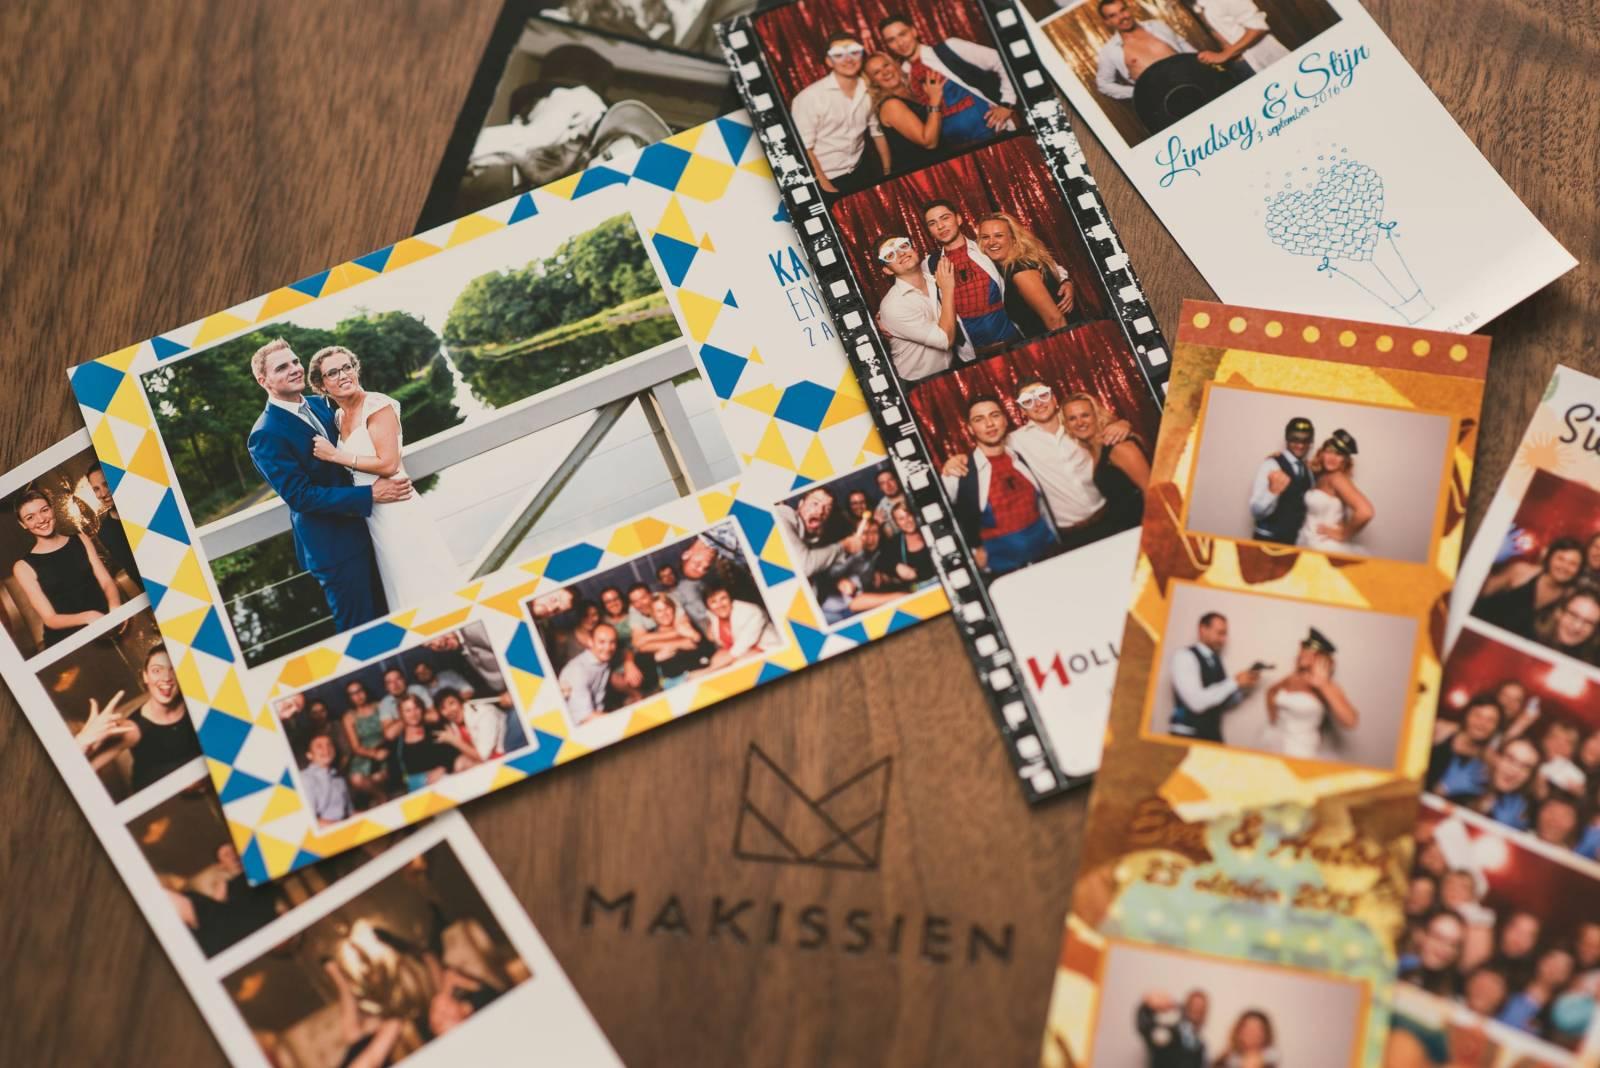 Makissien - Photobooth - House of Weddings - 29